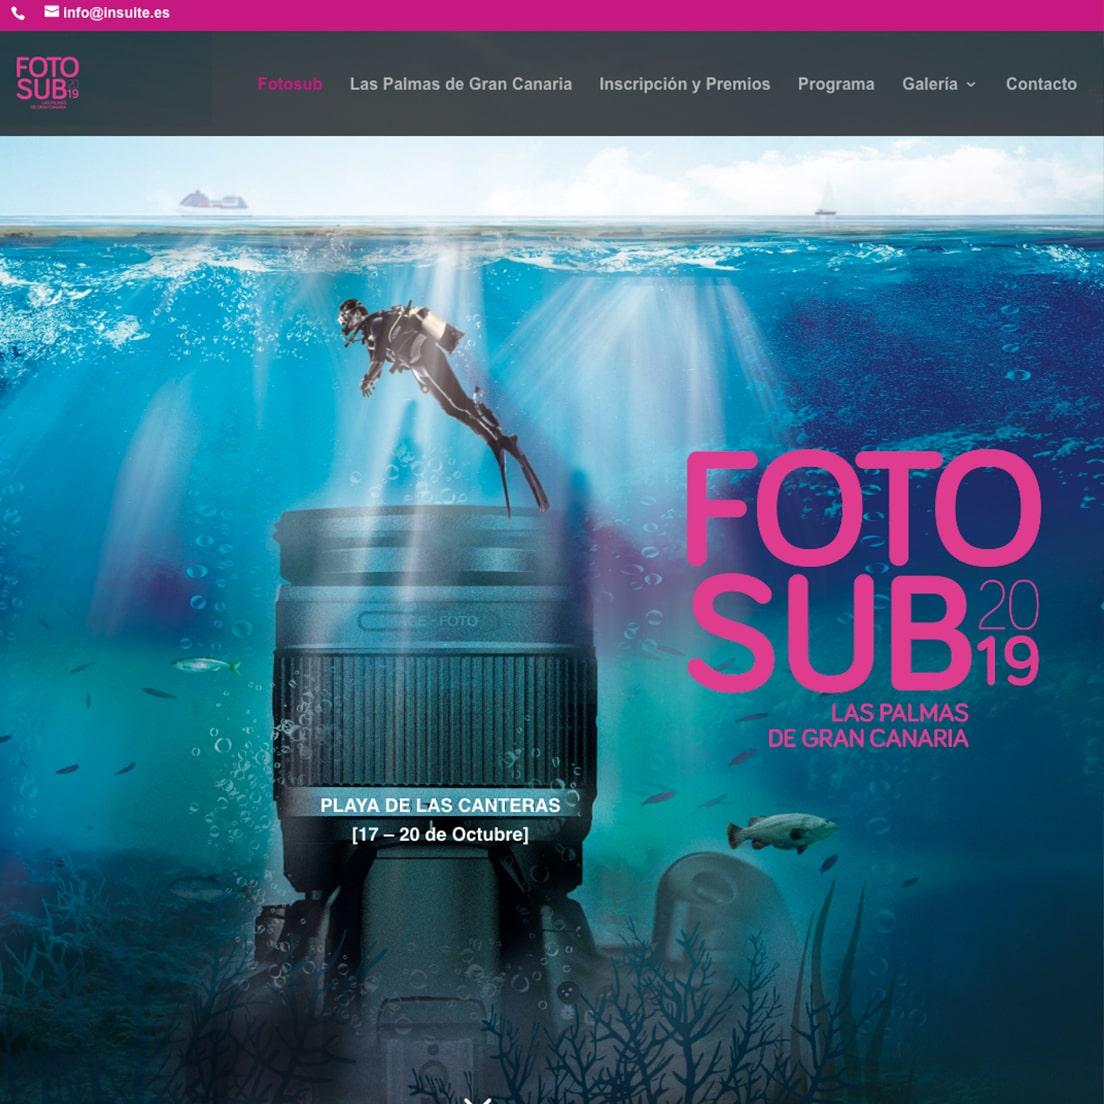 Fotosub 2019